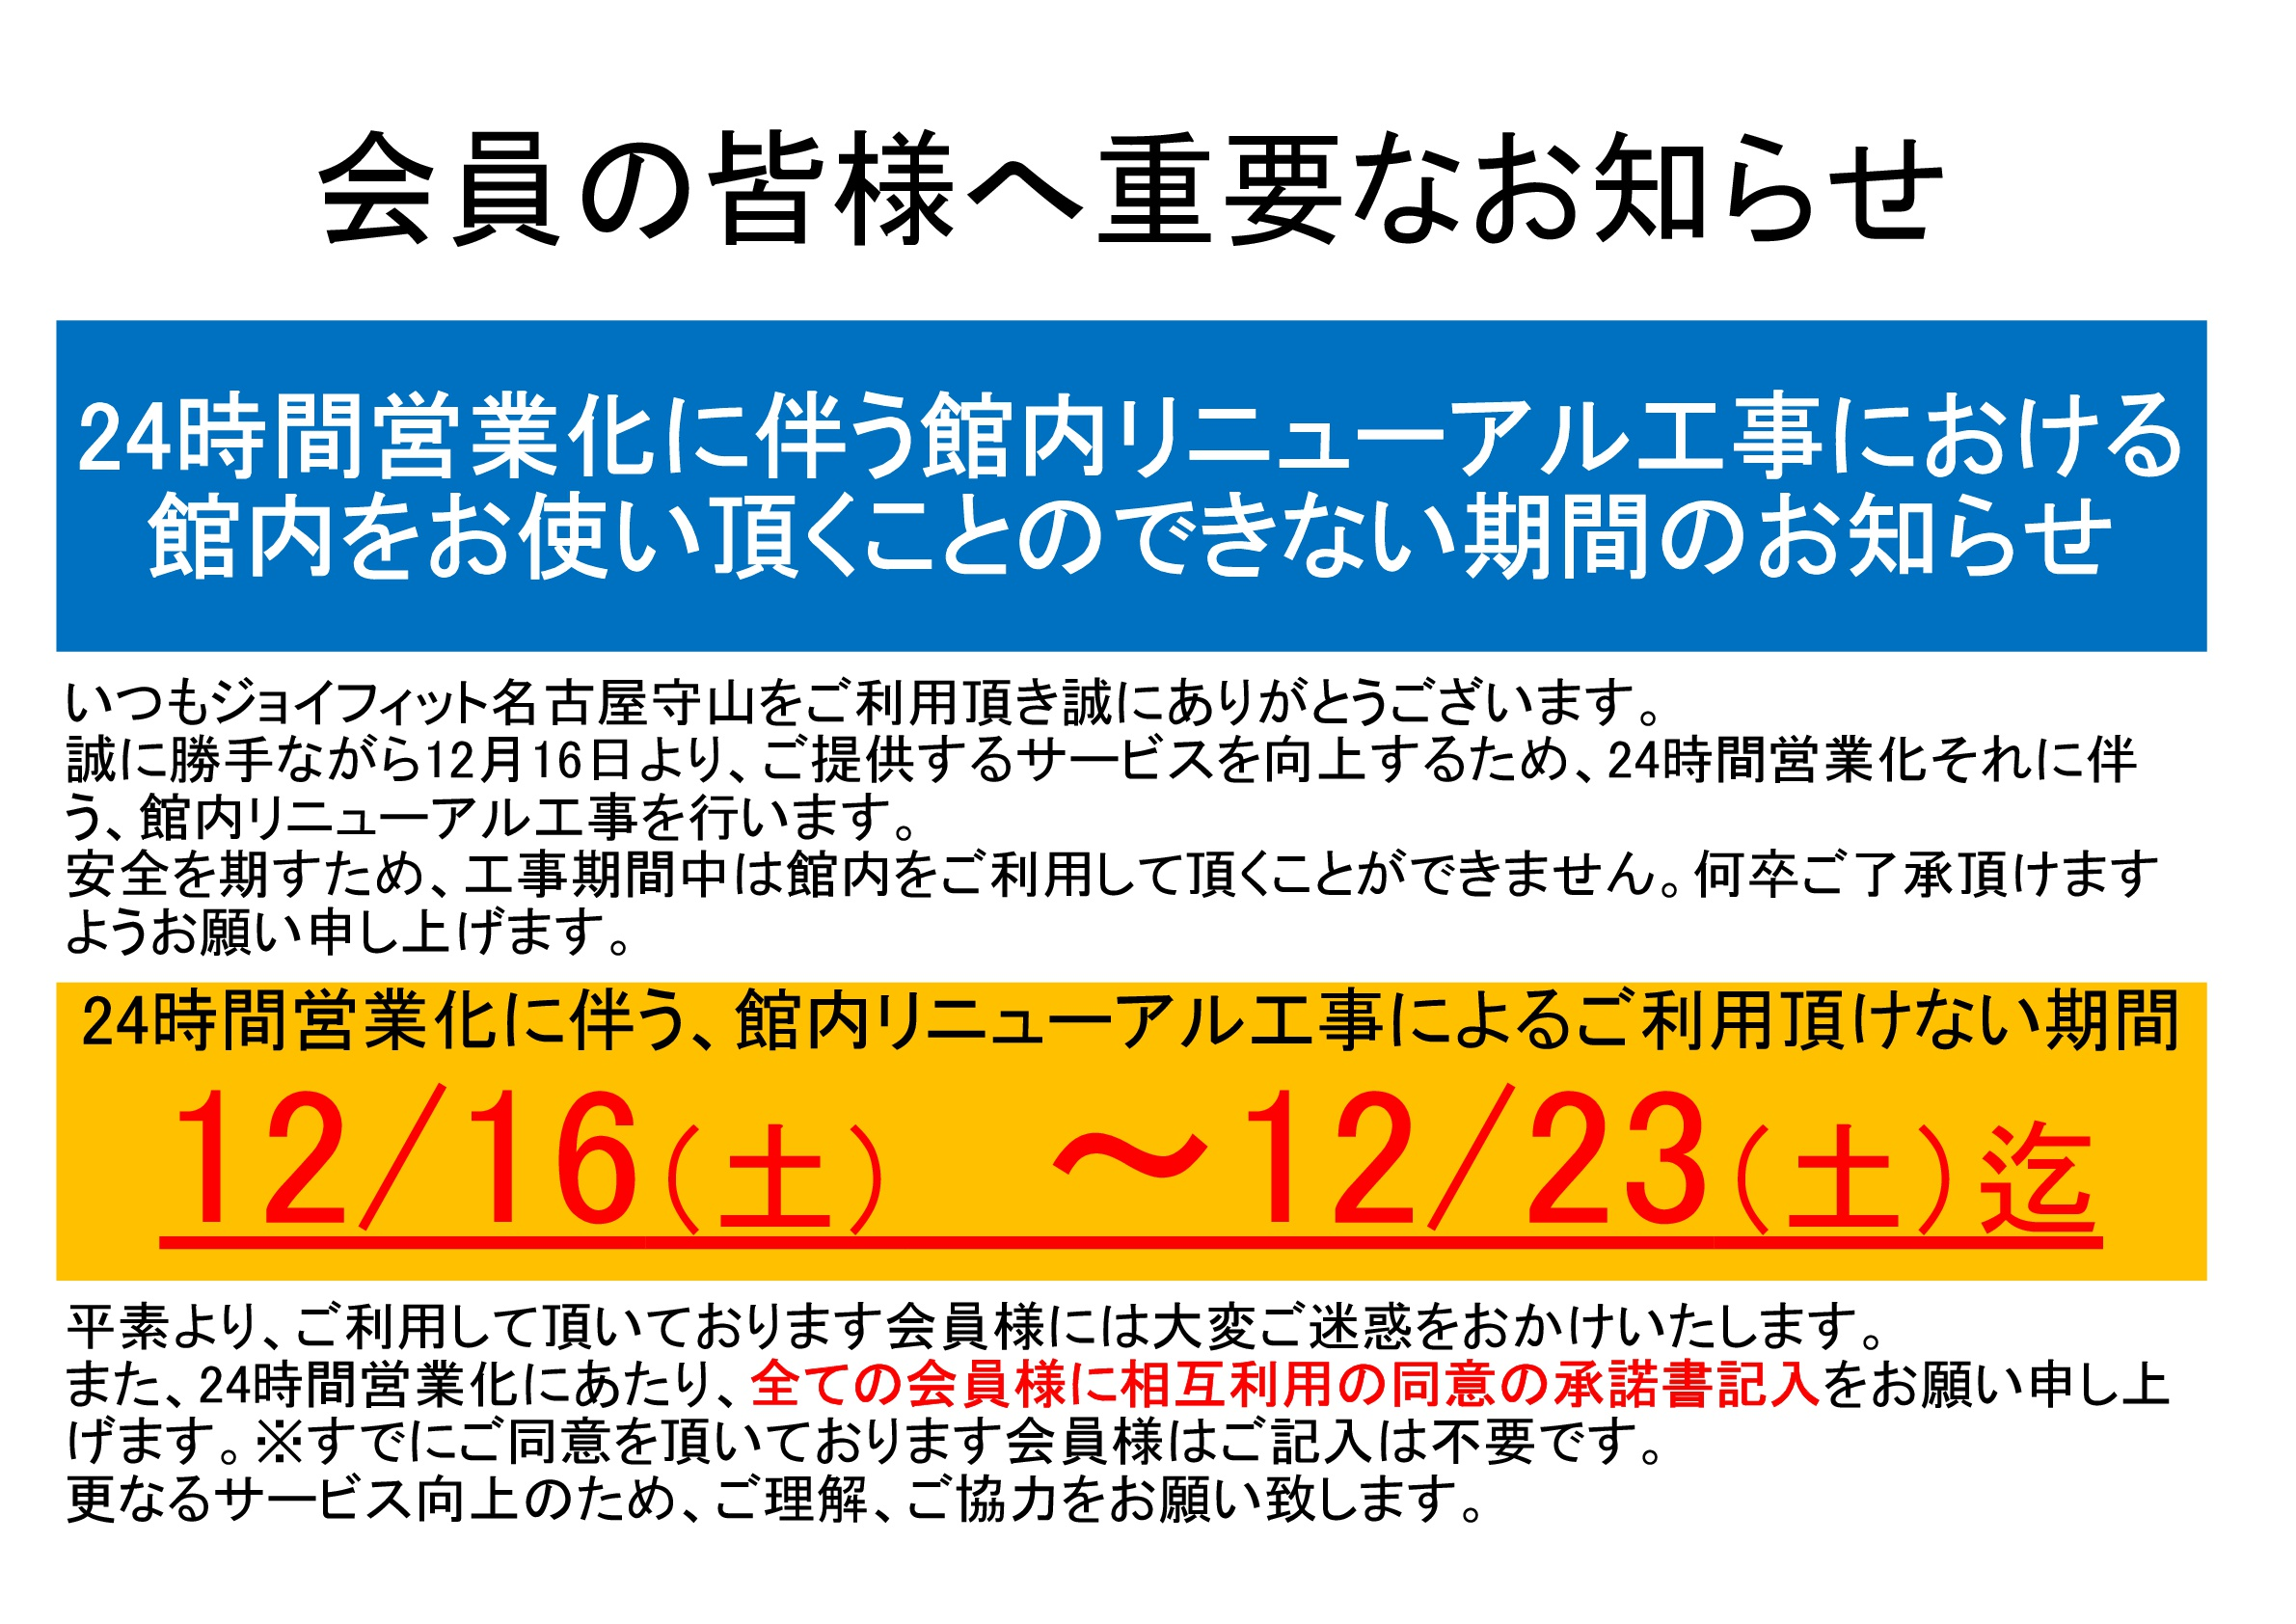 2017/07/170600_JF_moriyama_B4_o_1